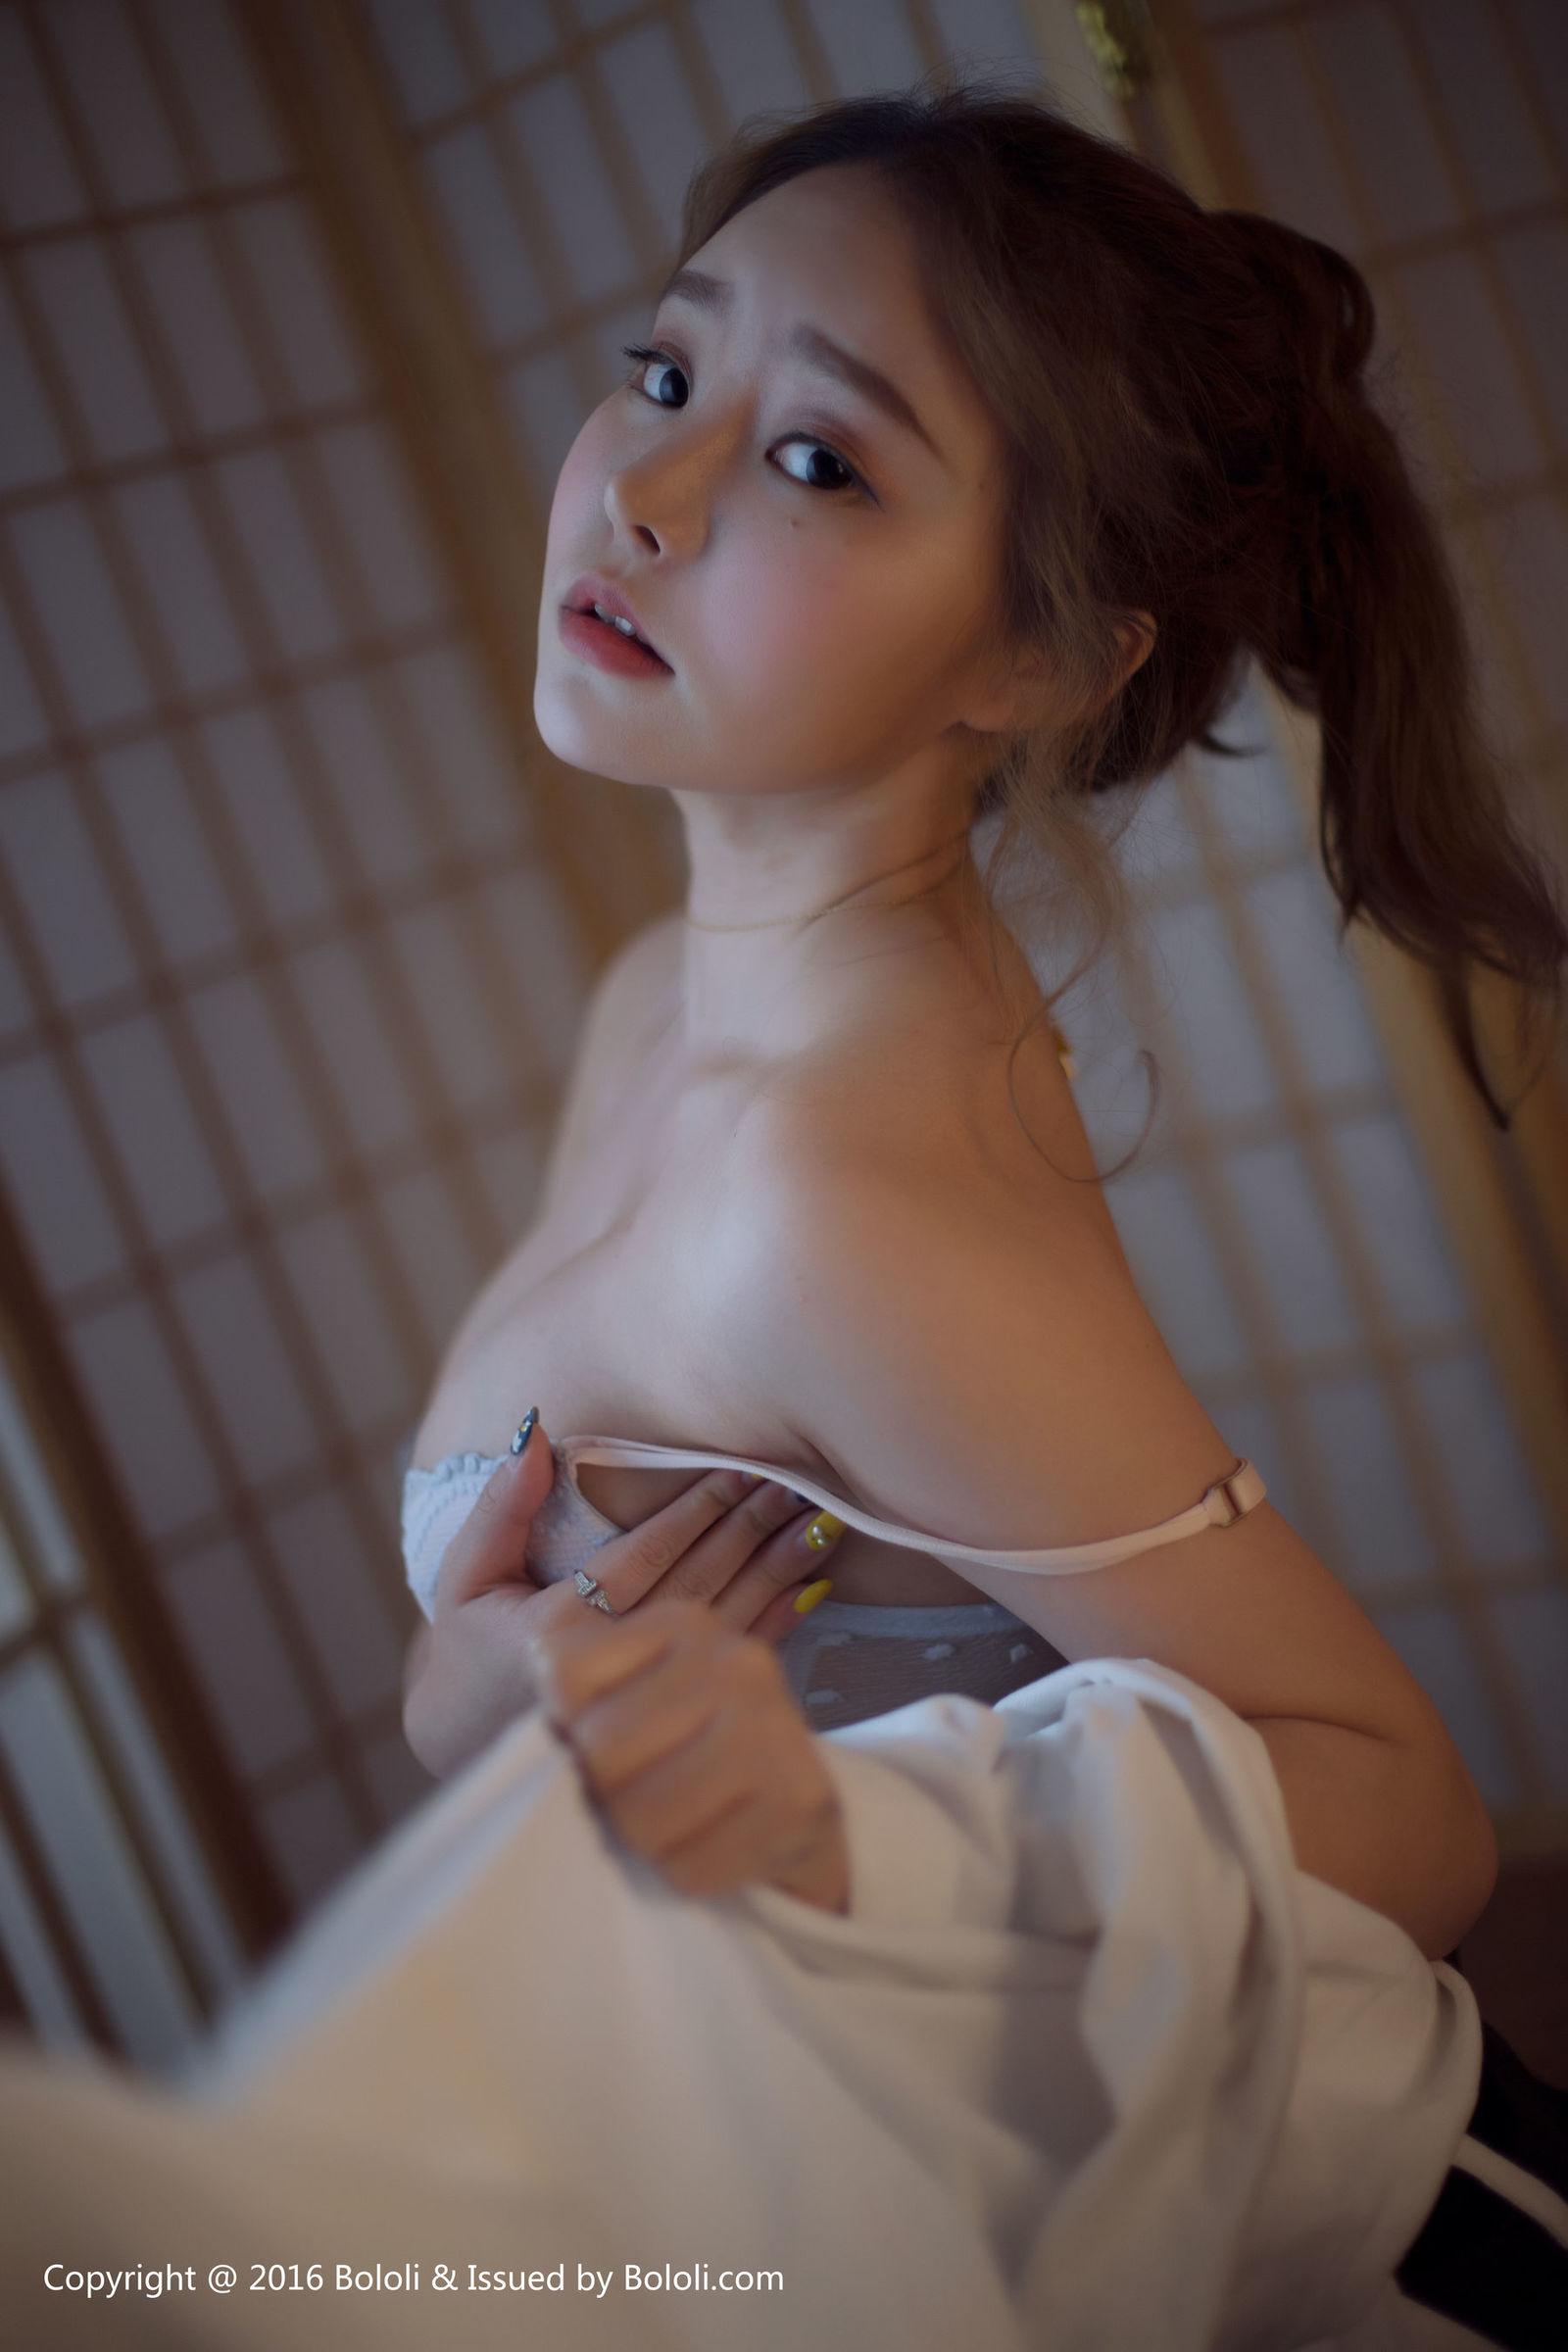 [BoLoli波萝社] BOL135 柳侑绮 - 剣道の女 丝袜美图[25P]